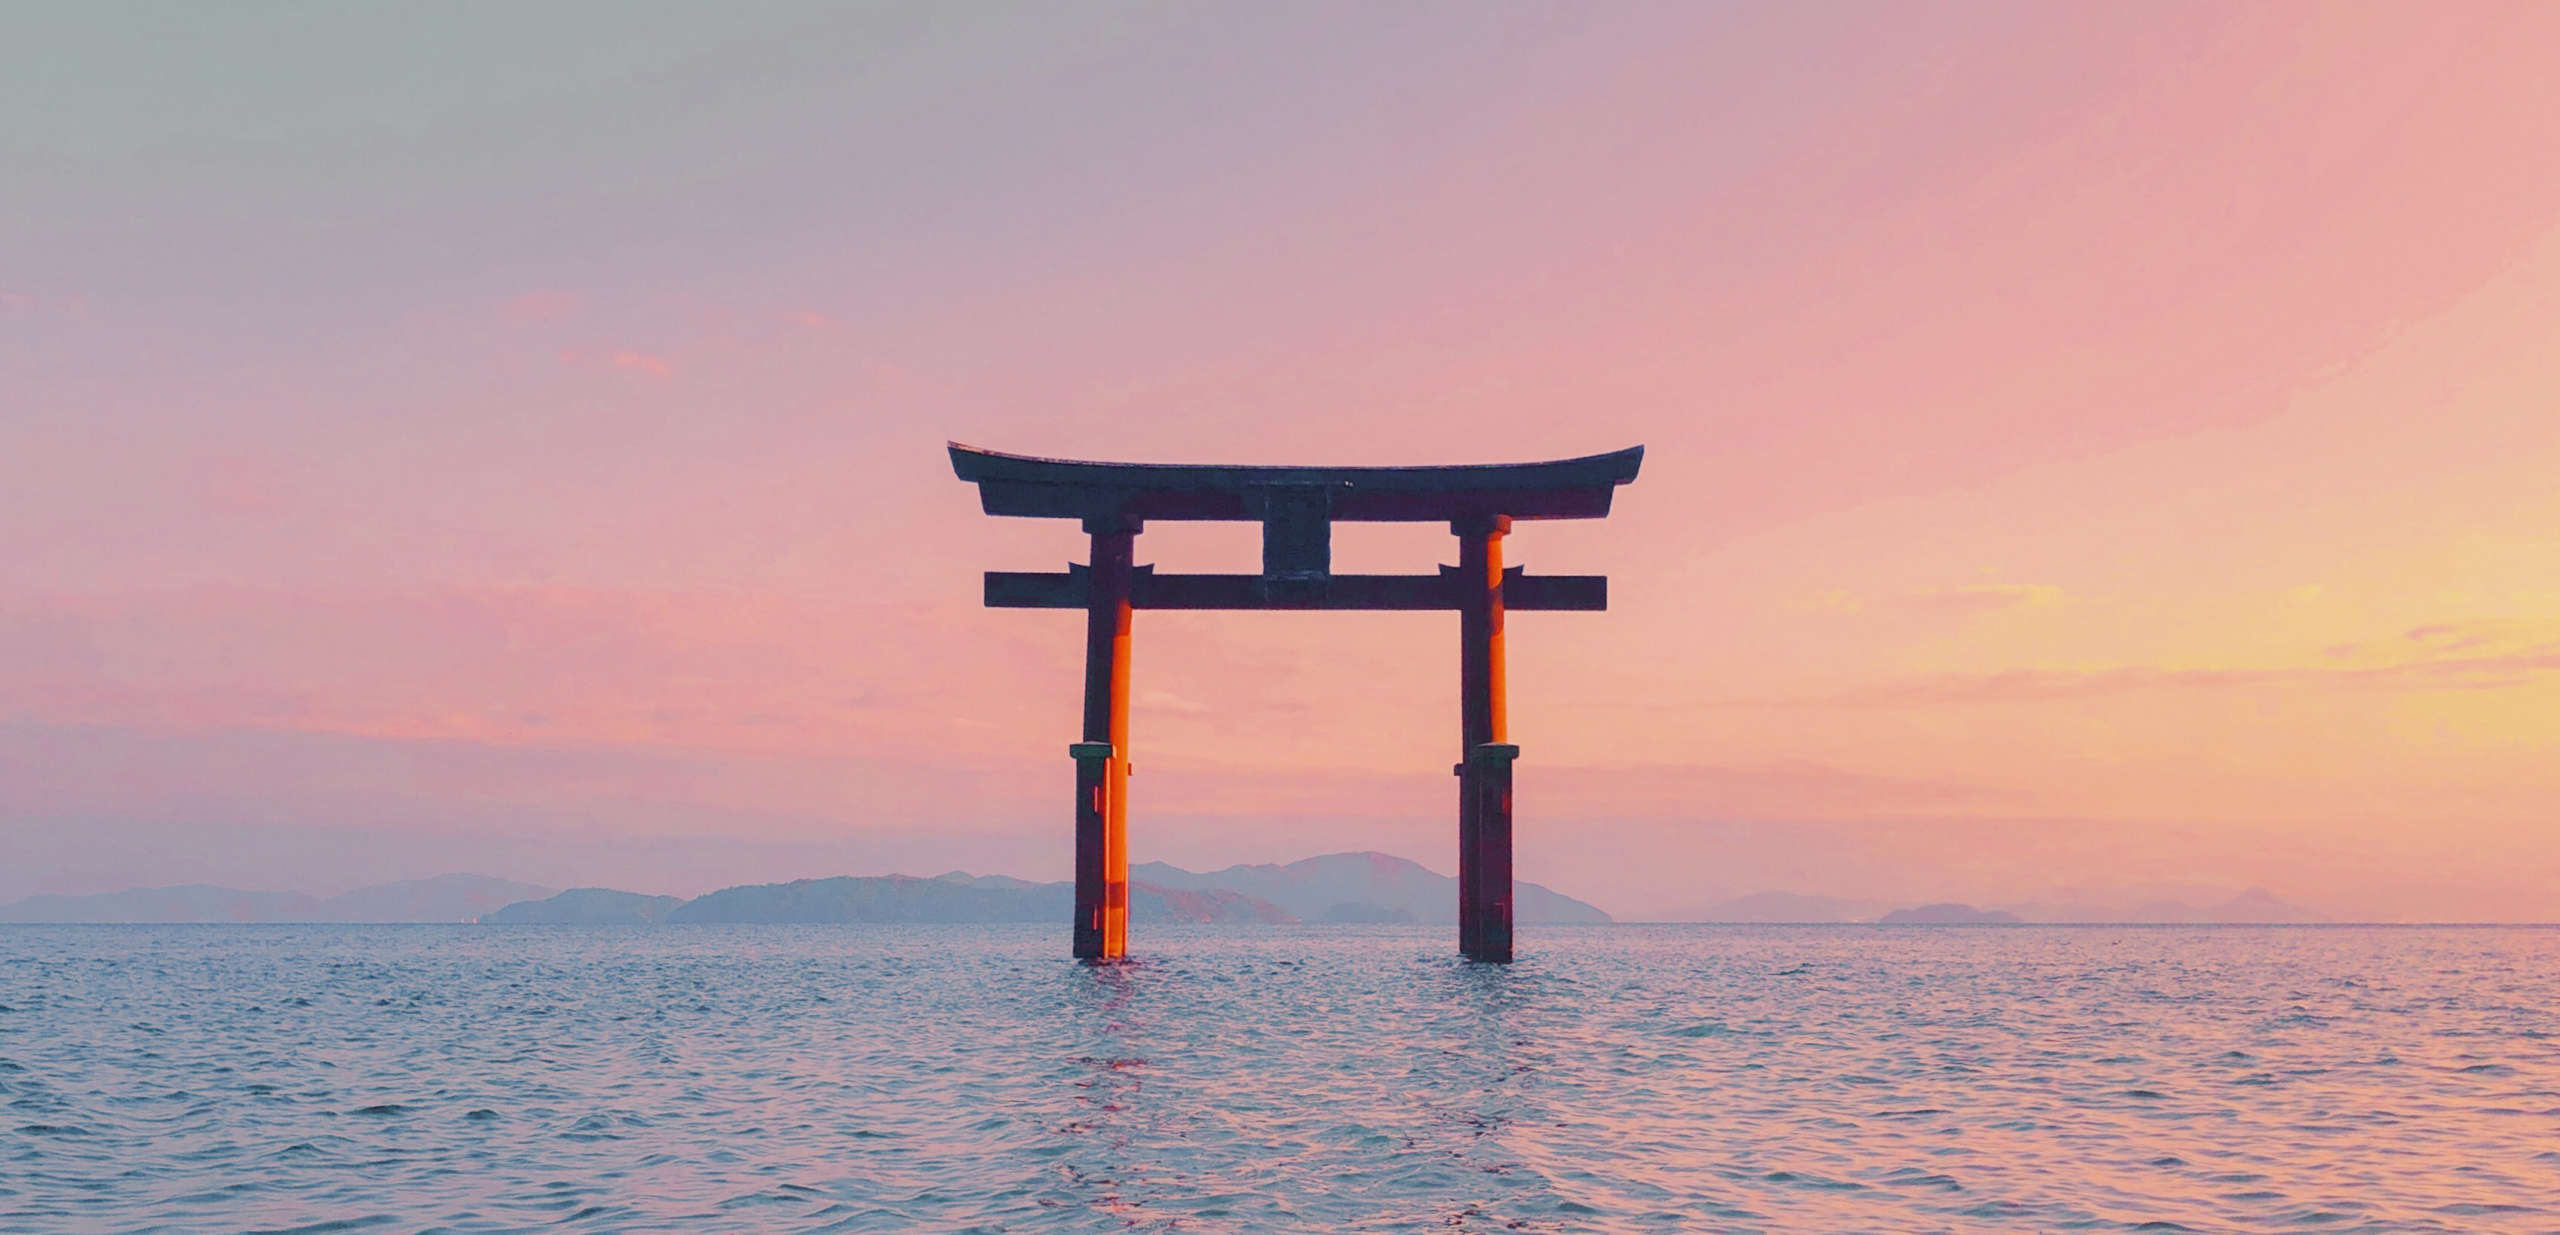 Japan Autumn 2019: Lake Biwa Shirahige Shrine, Kyoto Mameshiba Cafe + why I am wary of tourist activities involving animals